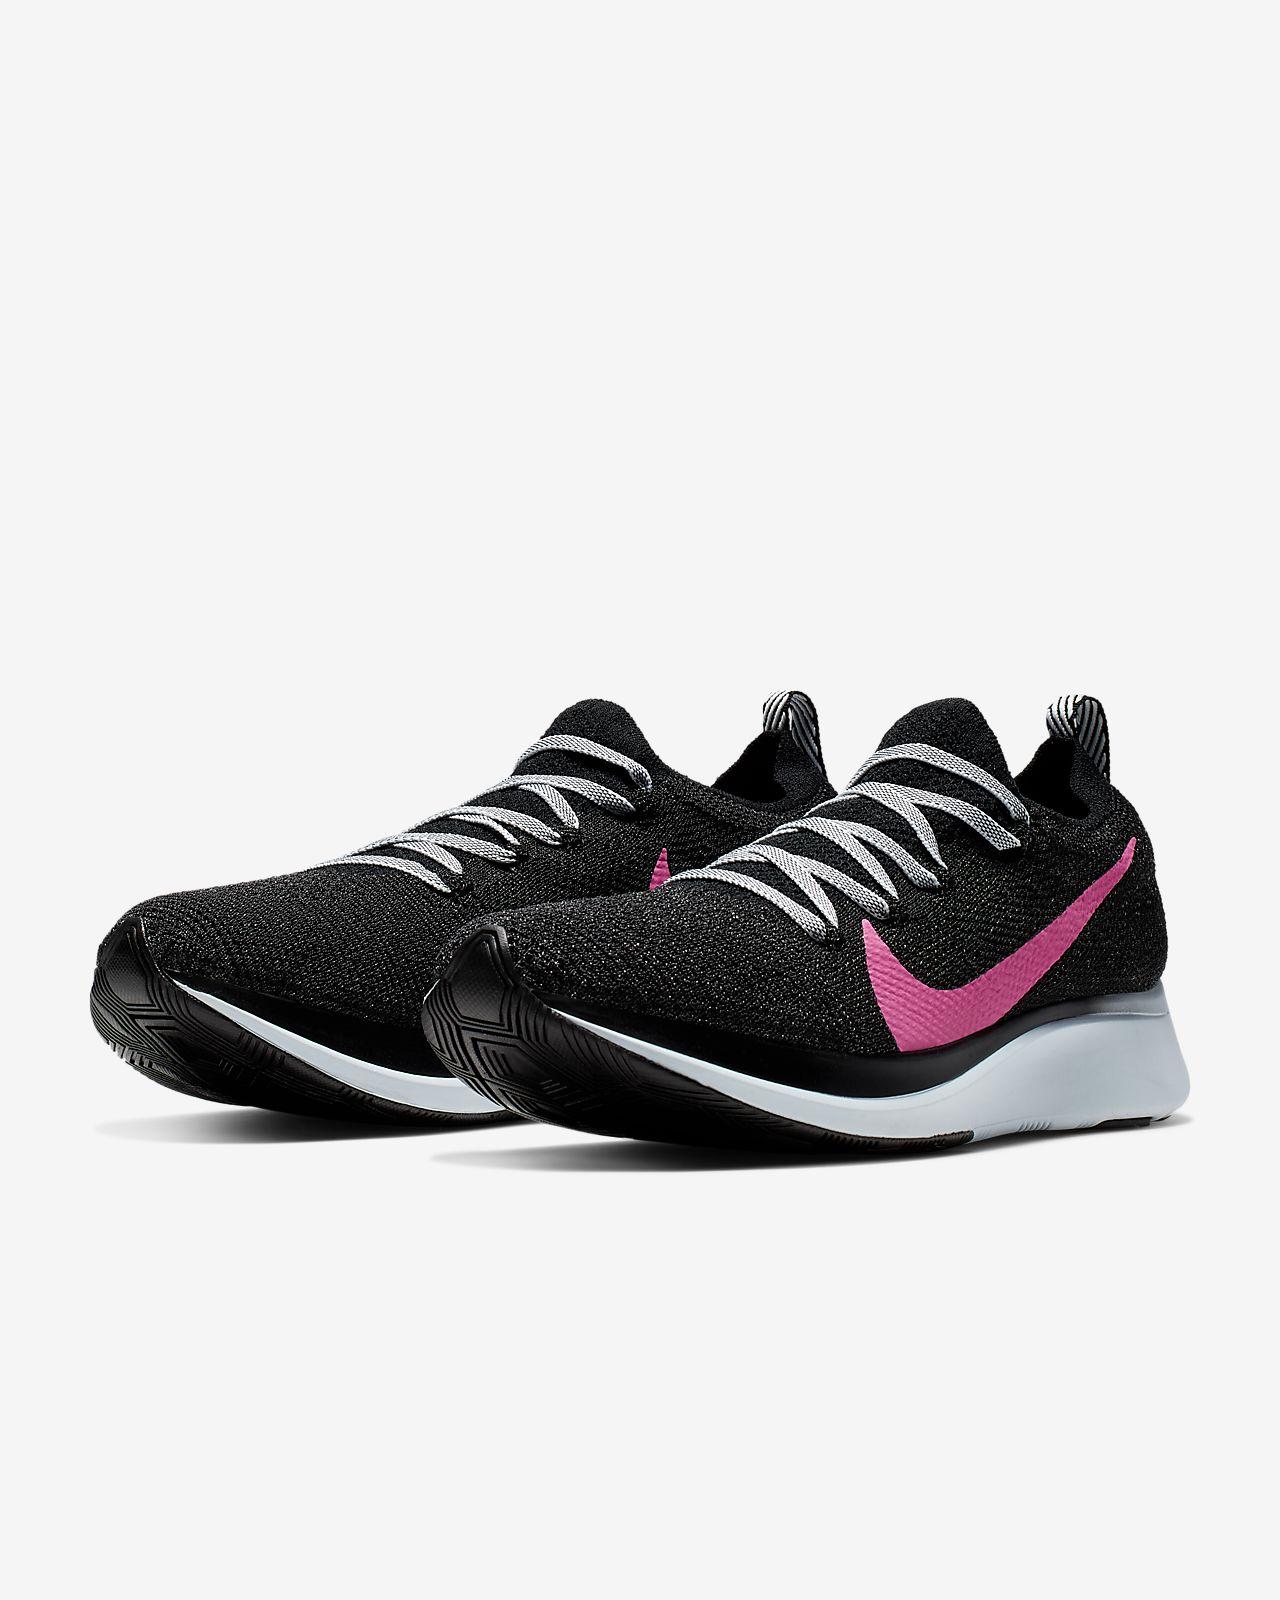 95ebc4b4062 Nike Zoom Fly Flyknit Women s Running Shoe . Nike.com